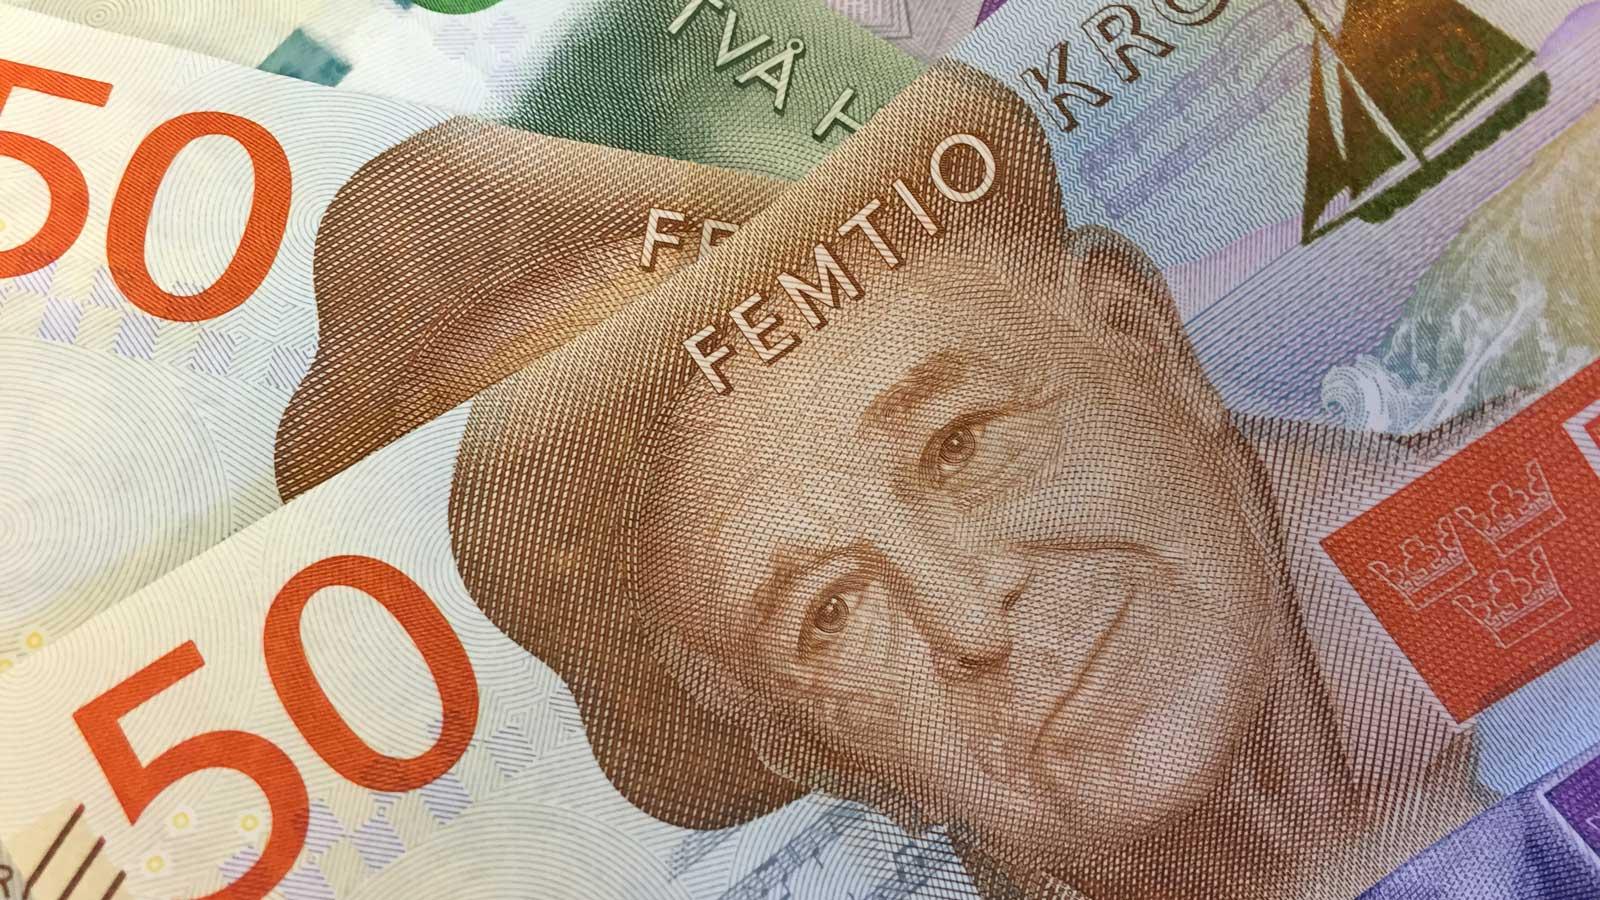 Nya pengar Evert Taube Foto:Lisbeth Svensson